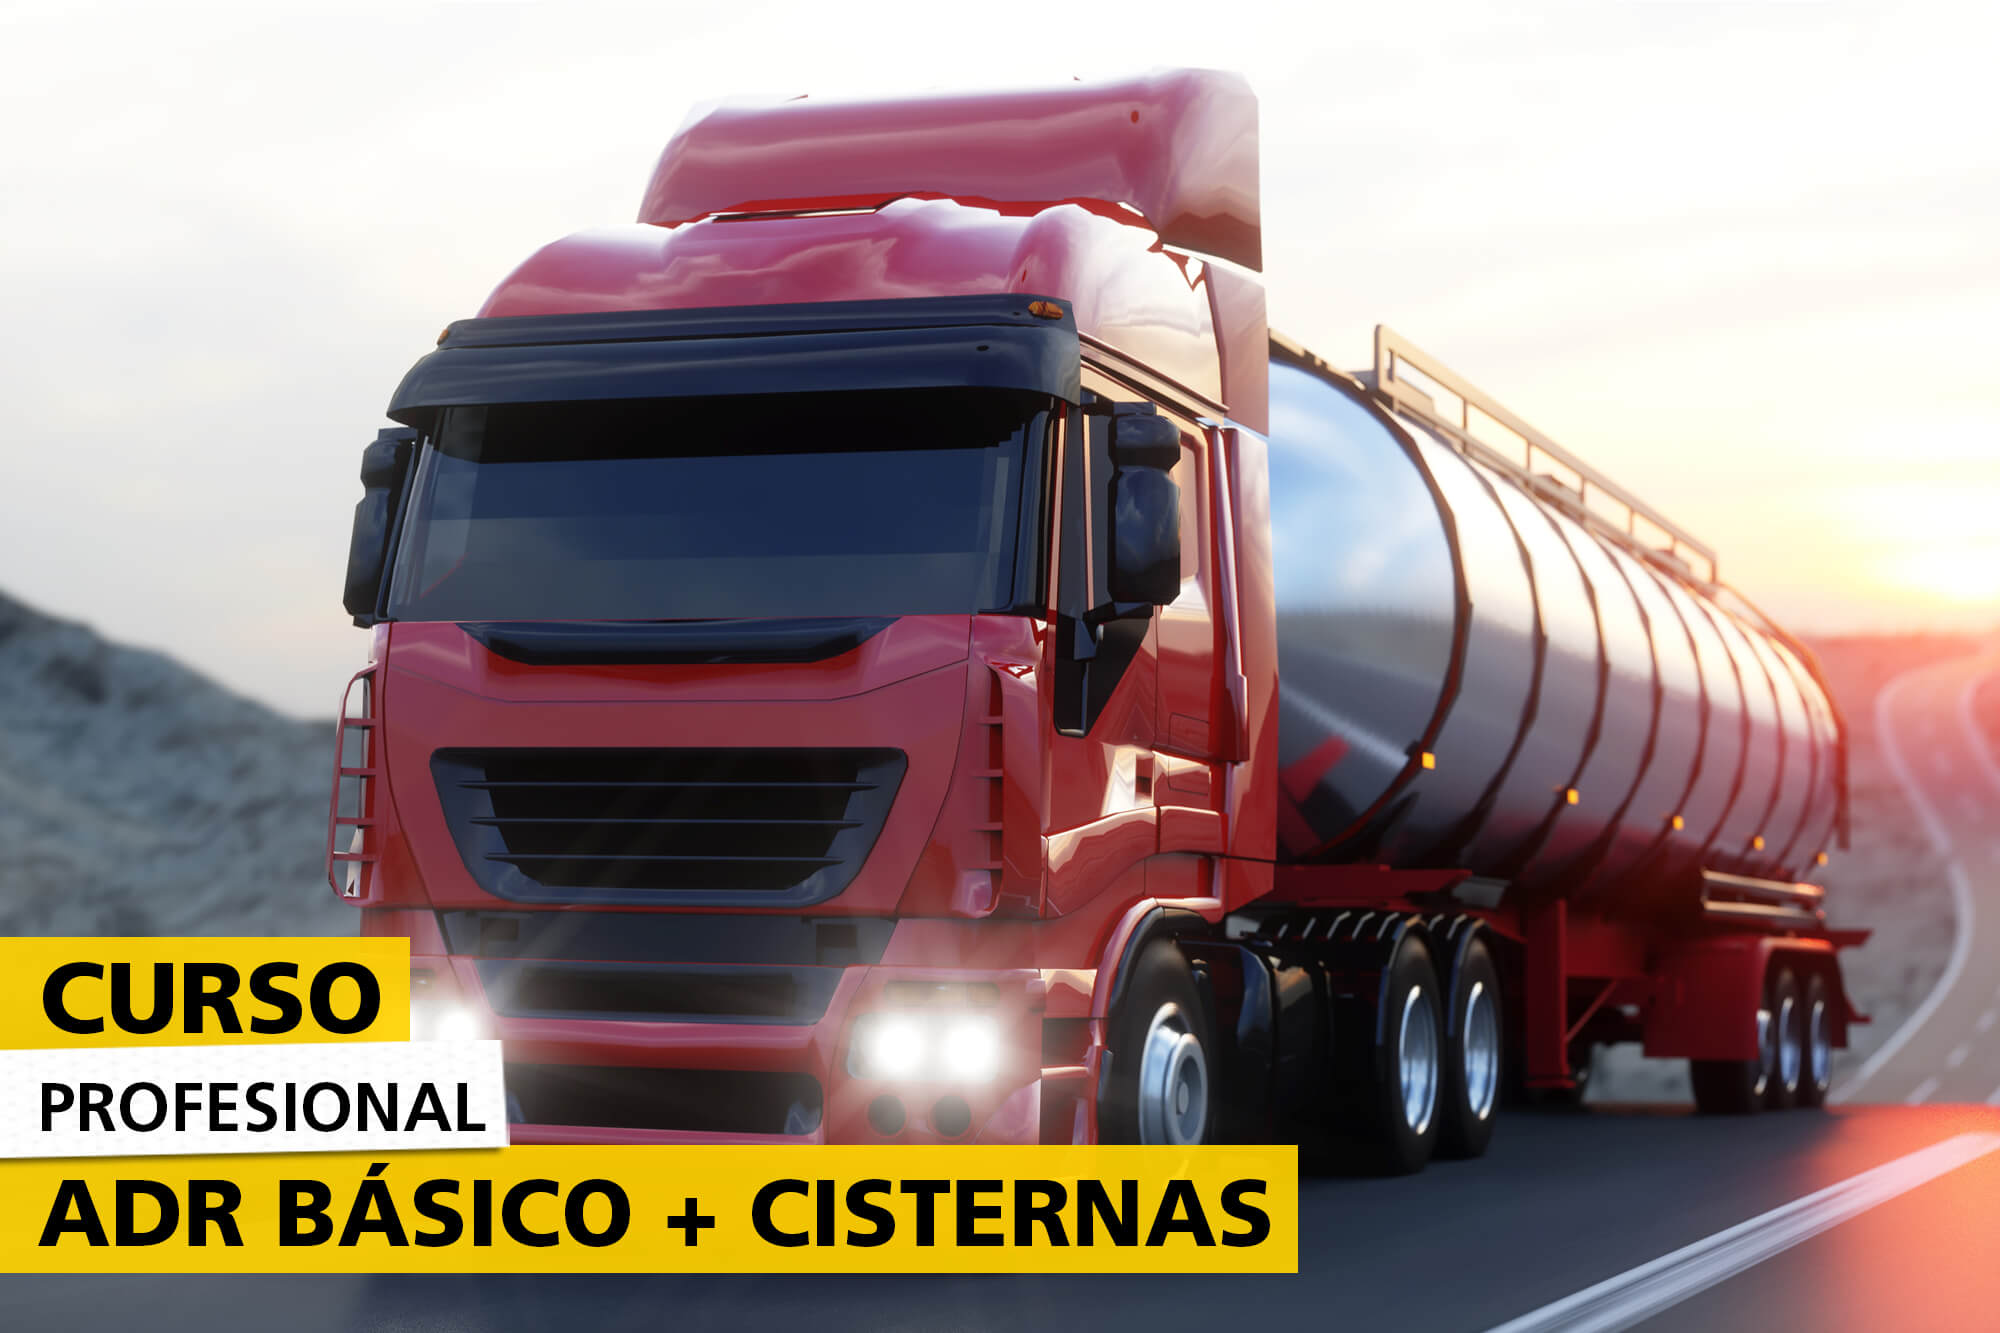 C-obtencion-adr-basico-cisternas-img-destacada